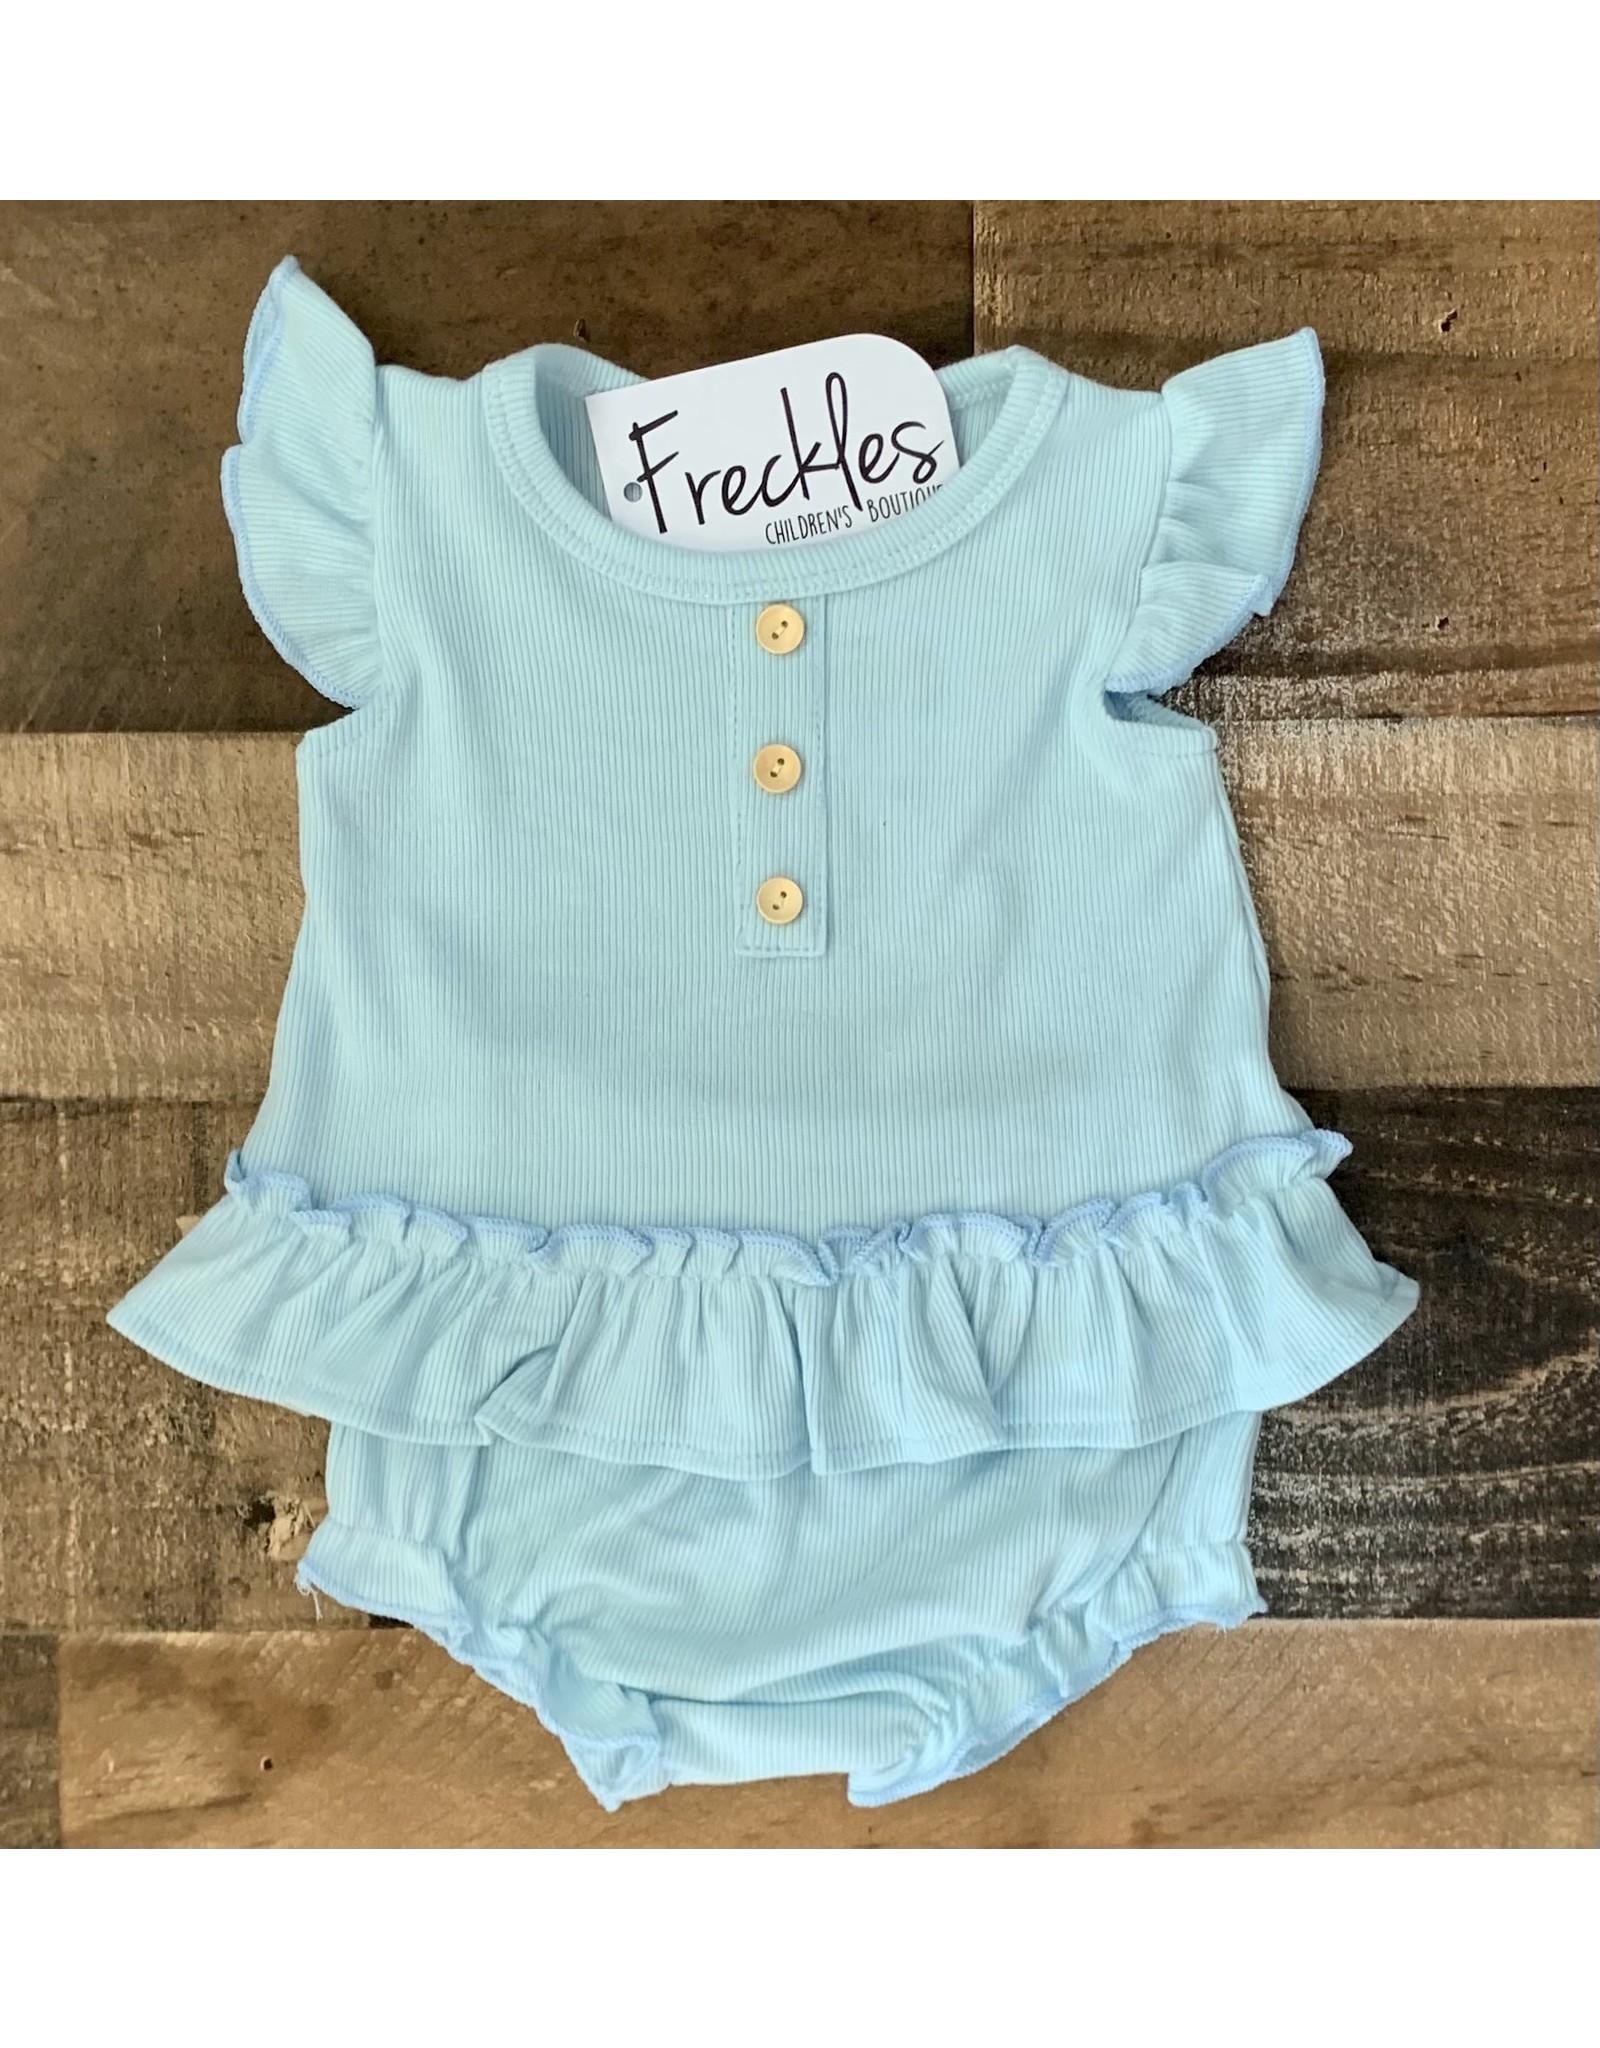 loved by Jade Presley loved by jade presley-Jess Ribbed Button Set: Sky Blue